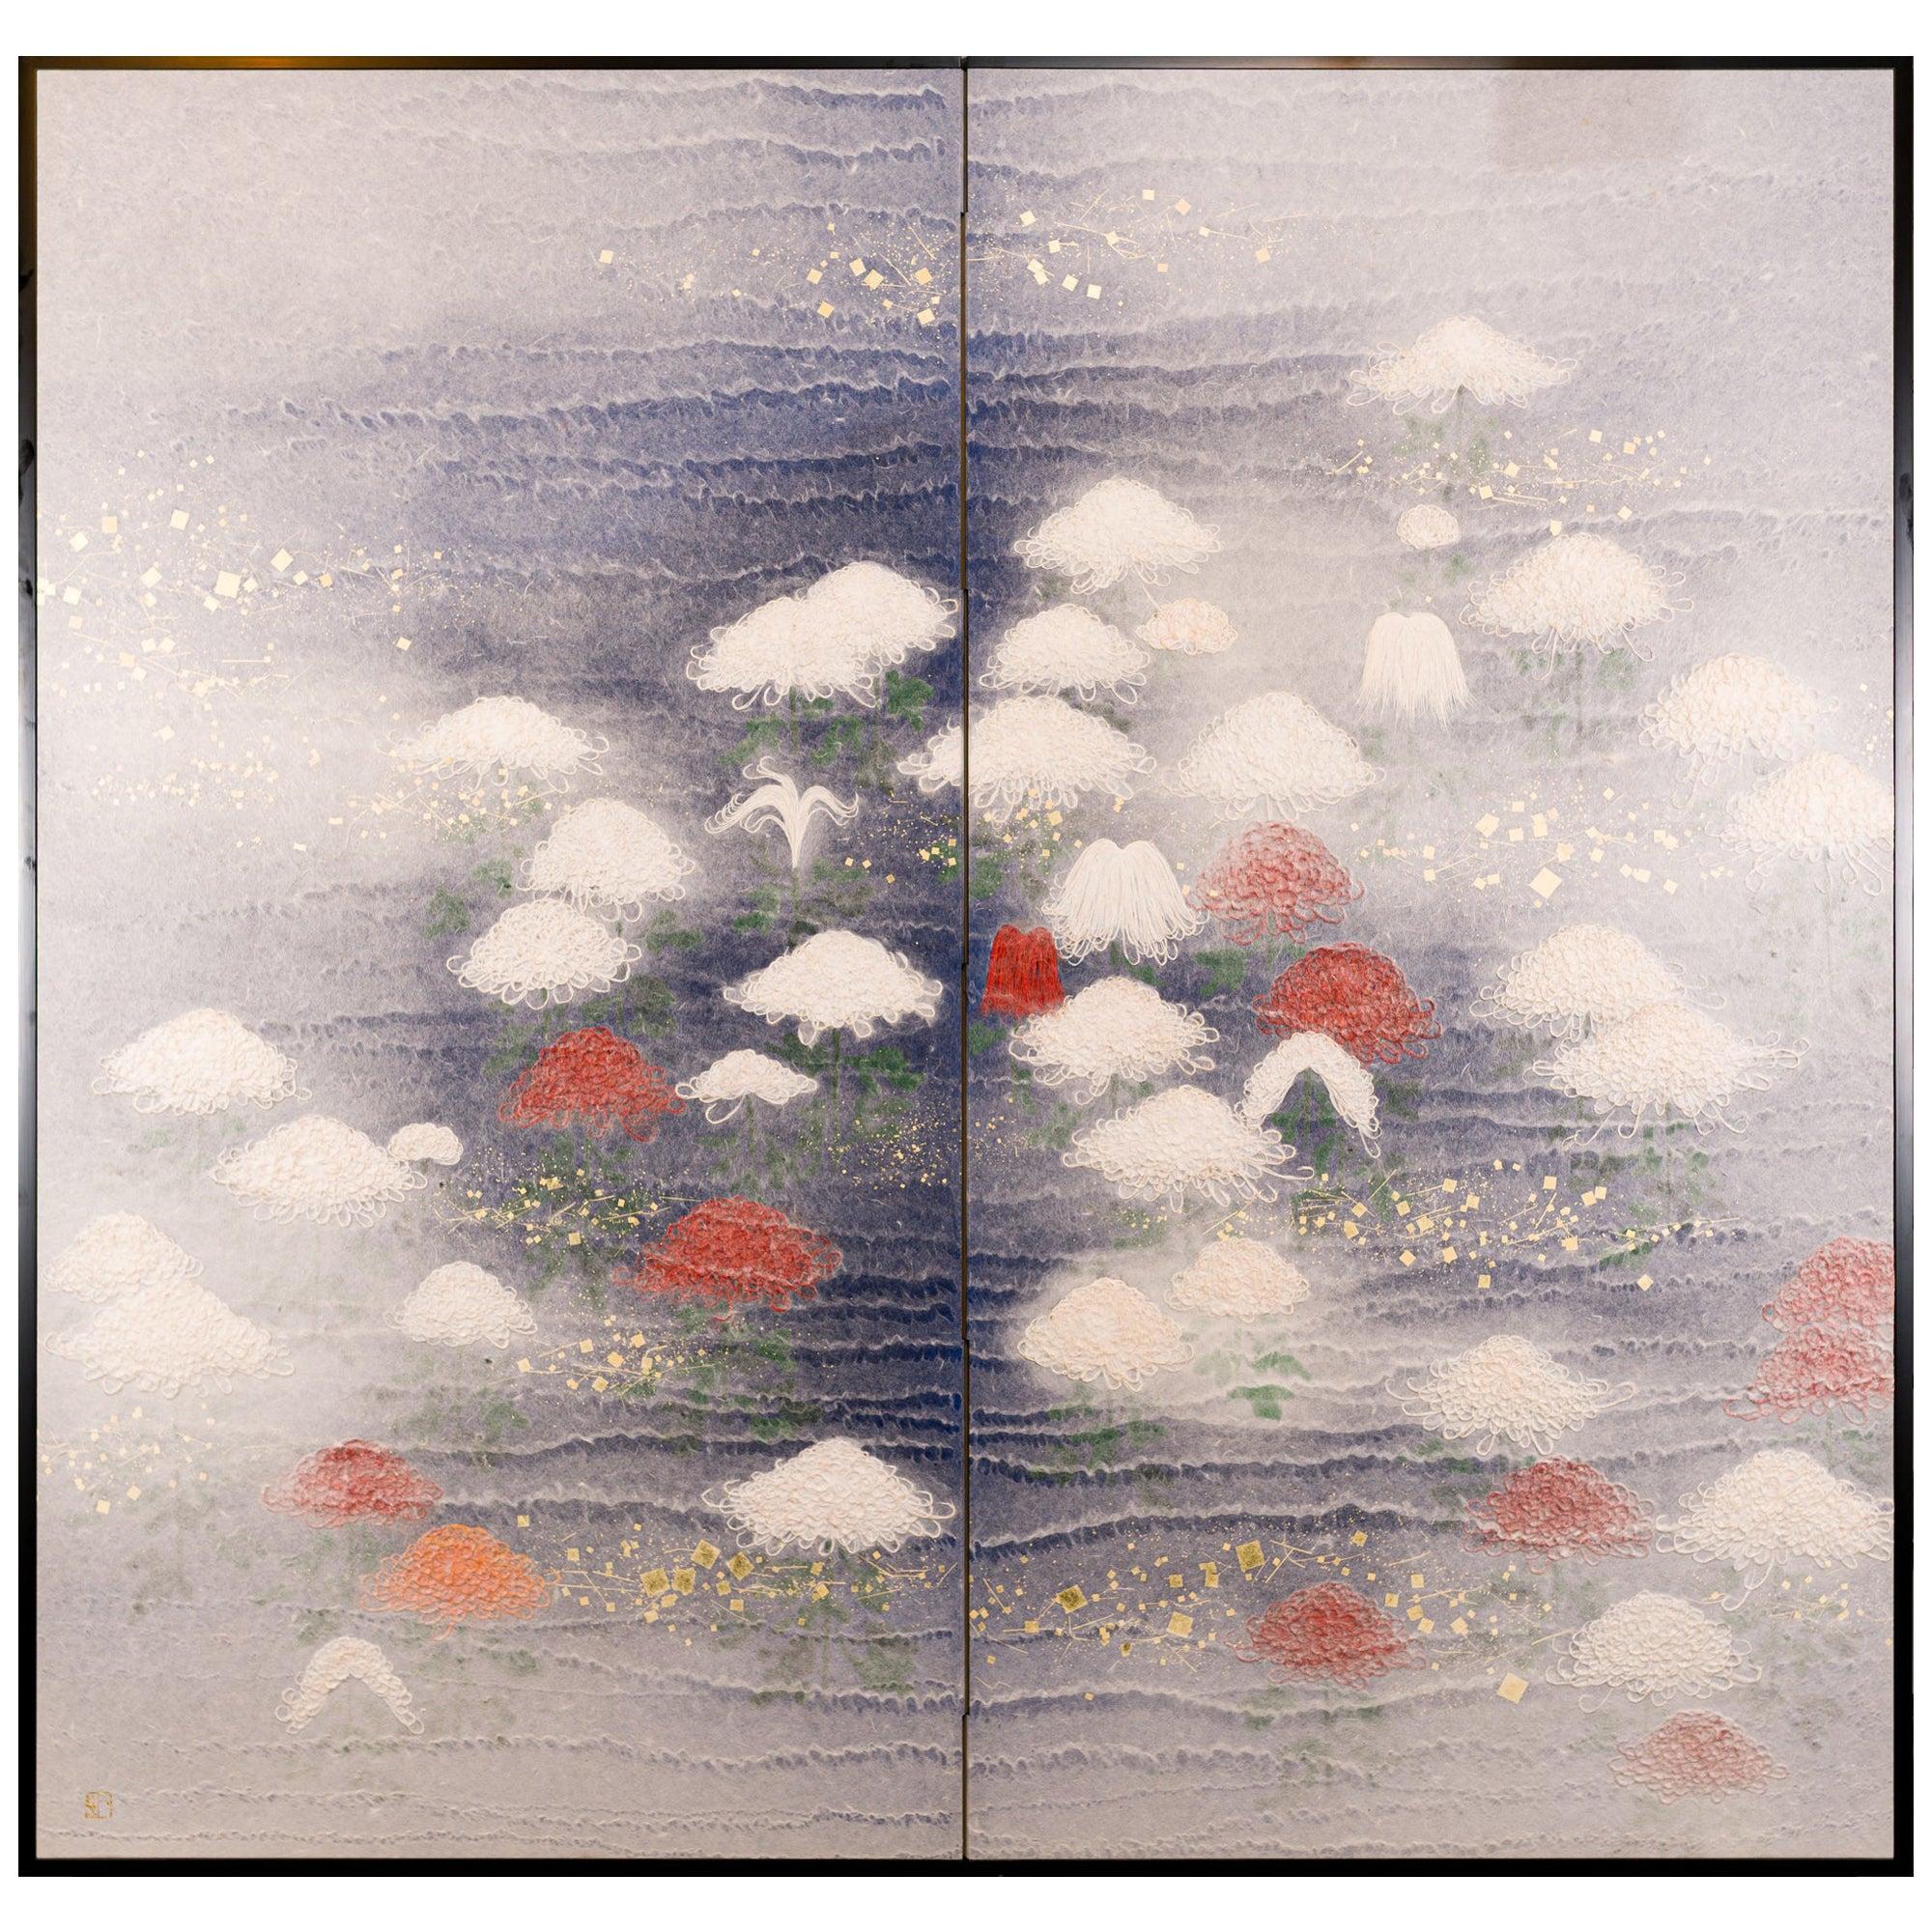 Japanese Two Panel Screen Chrysanthemums Through the Mist Obara Art Screen